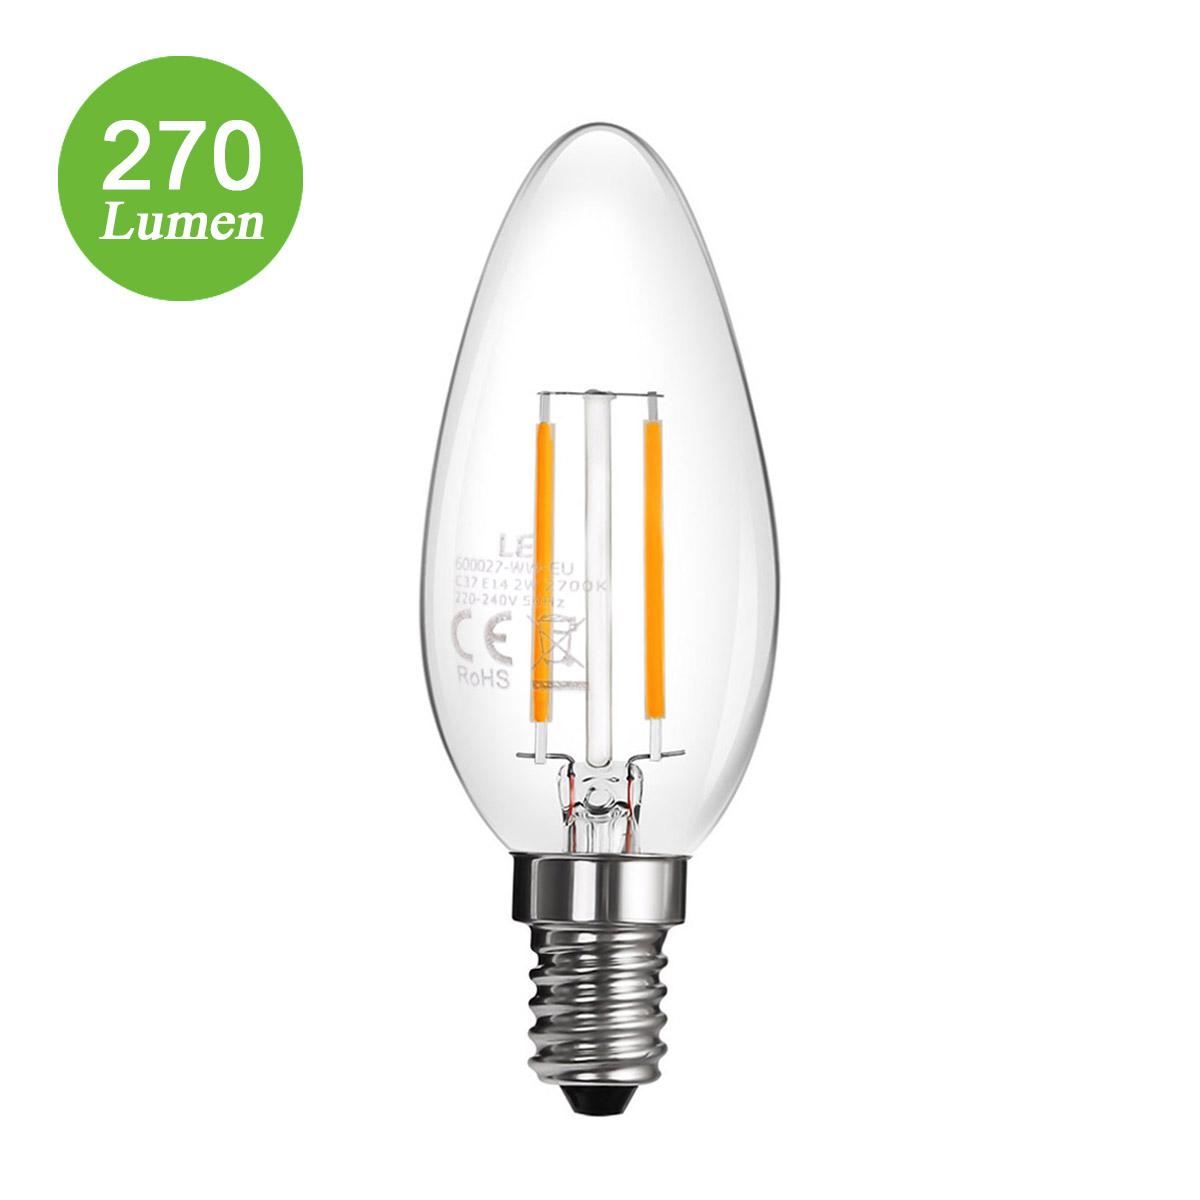 2W E14 LED Kerze mit Glühfaden, C37 270lm, 360° Abstrahlwinkel, ersetzt 25 Watt Glühlampe, Warmweiß